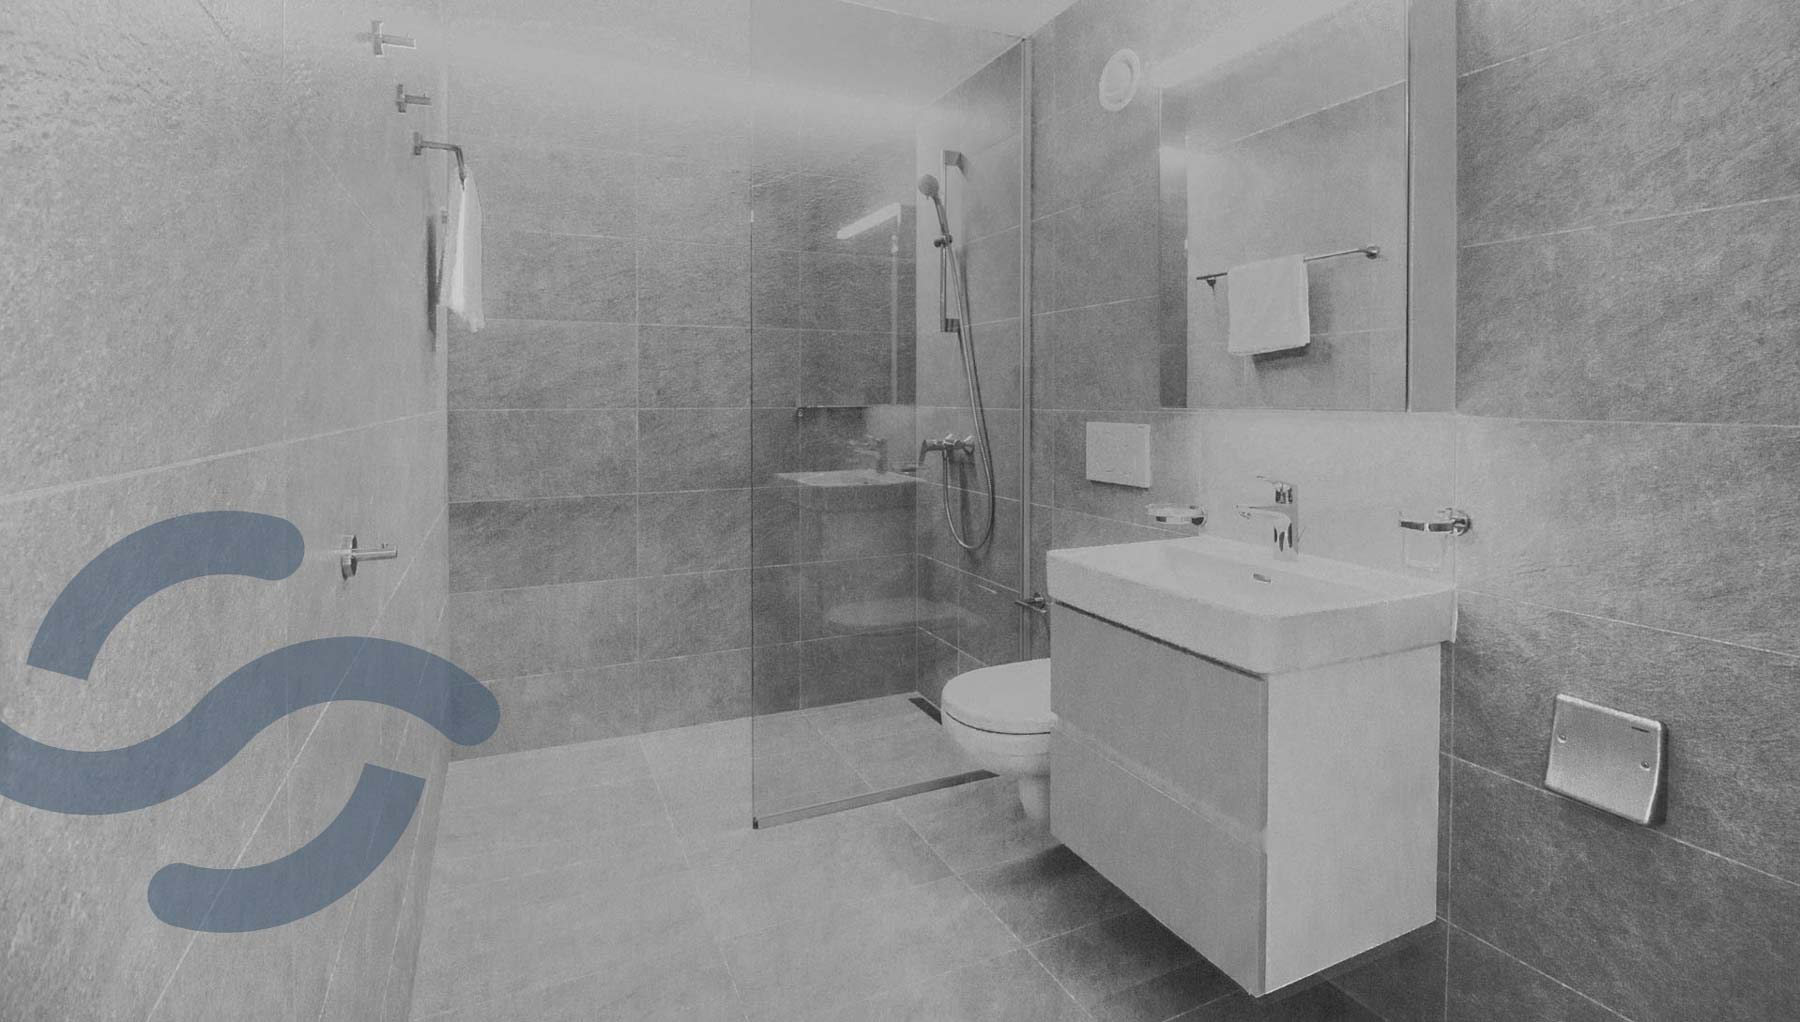 Eurocomponents modular bathroom pods